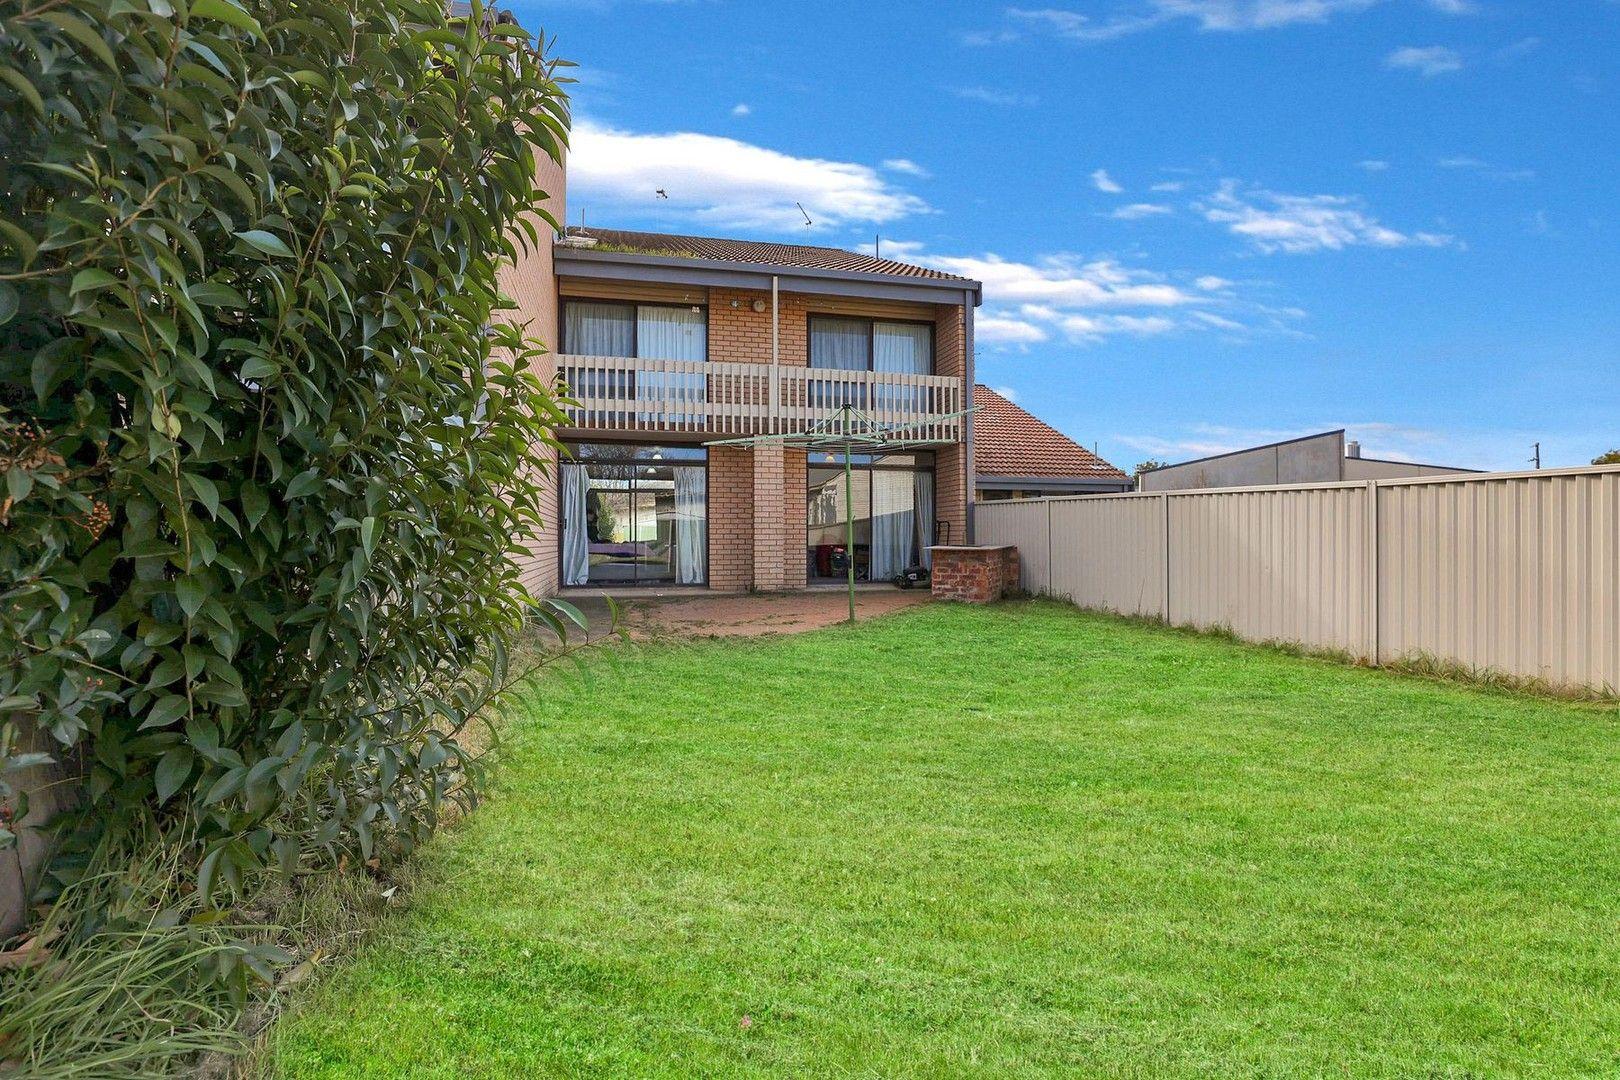 7/142 Durham Street, Bathurst NSW 2795, Image 0